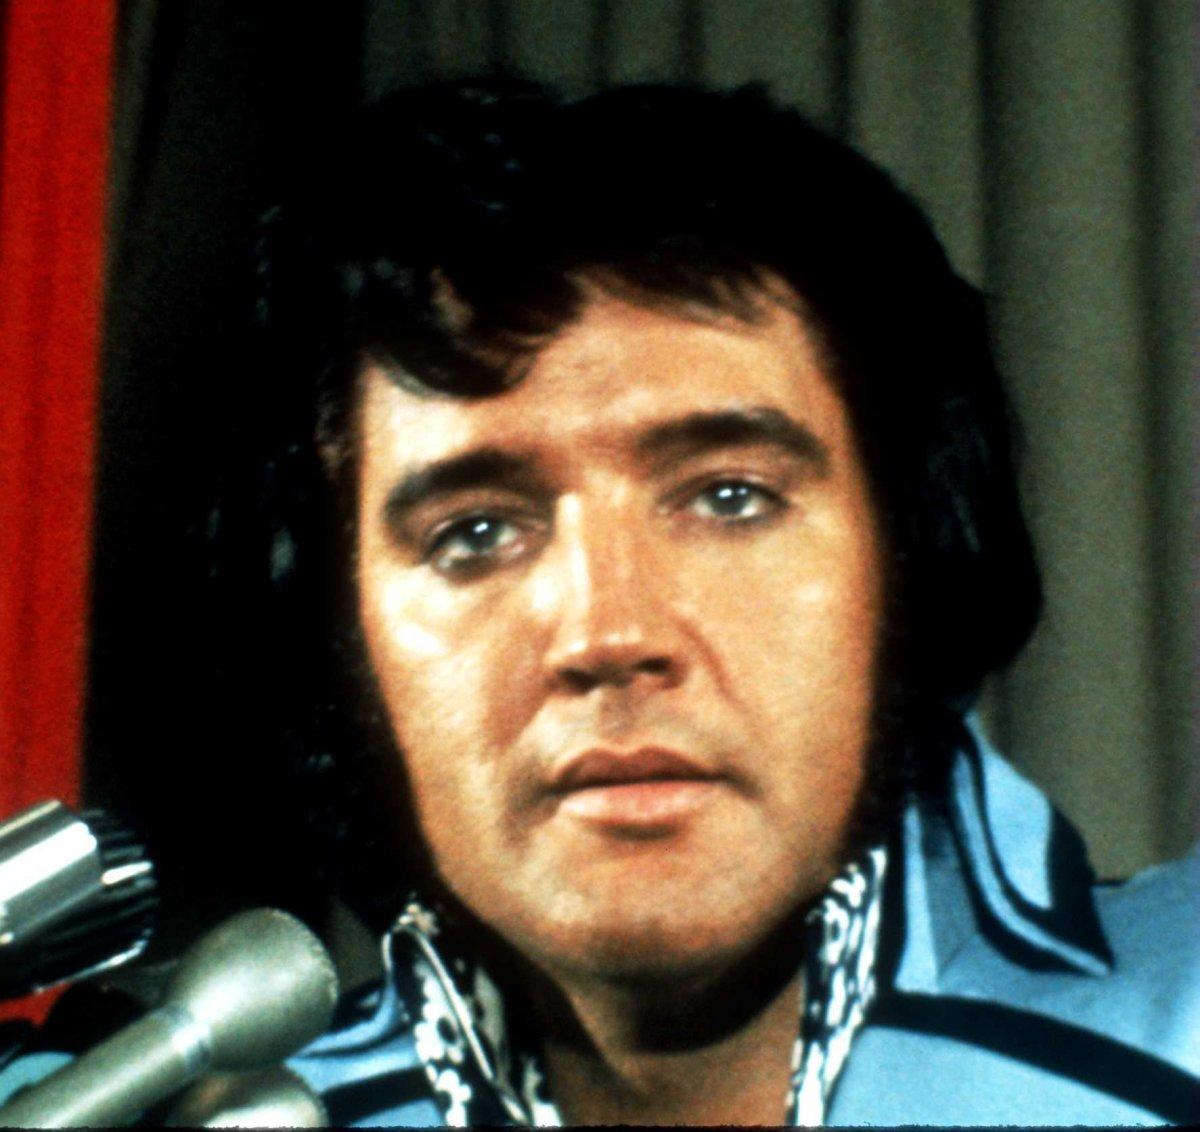 RARE 1978 Terry A West Oil Painting King Elvis Presley Art ...  |1977 Elvis Painting